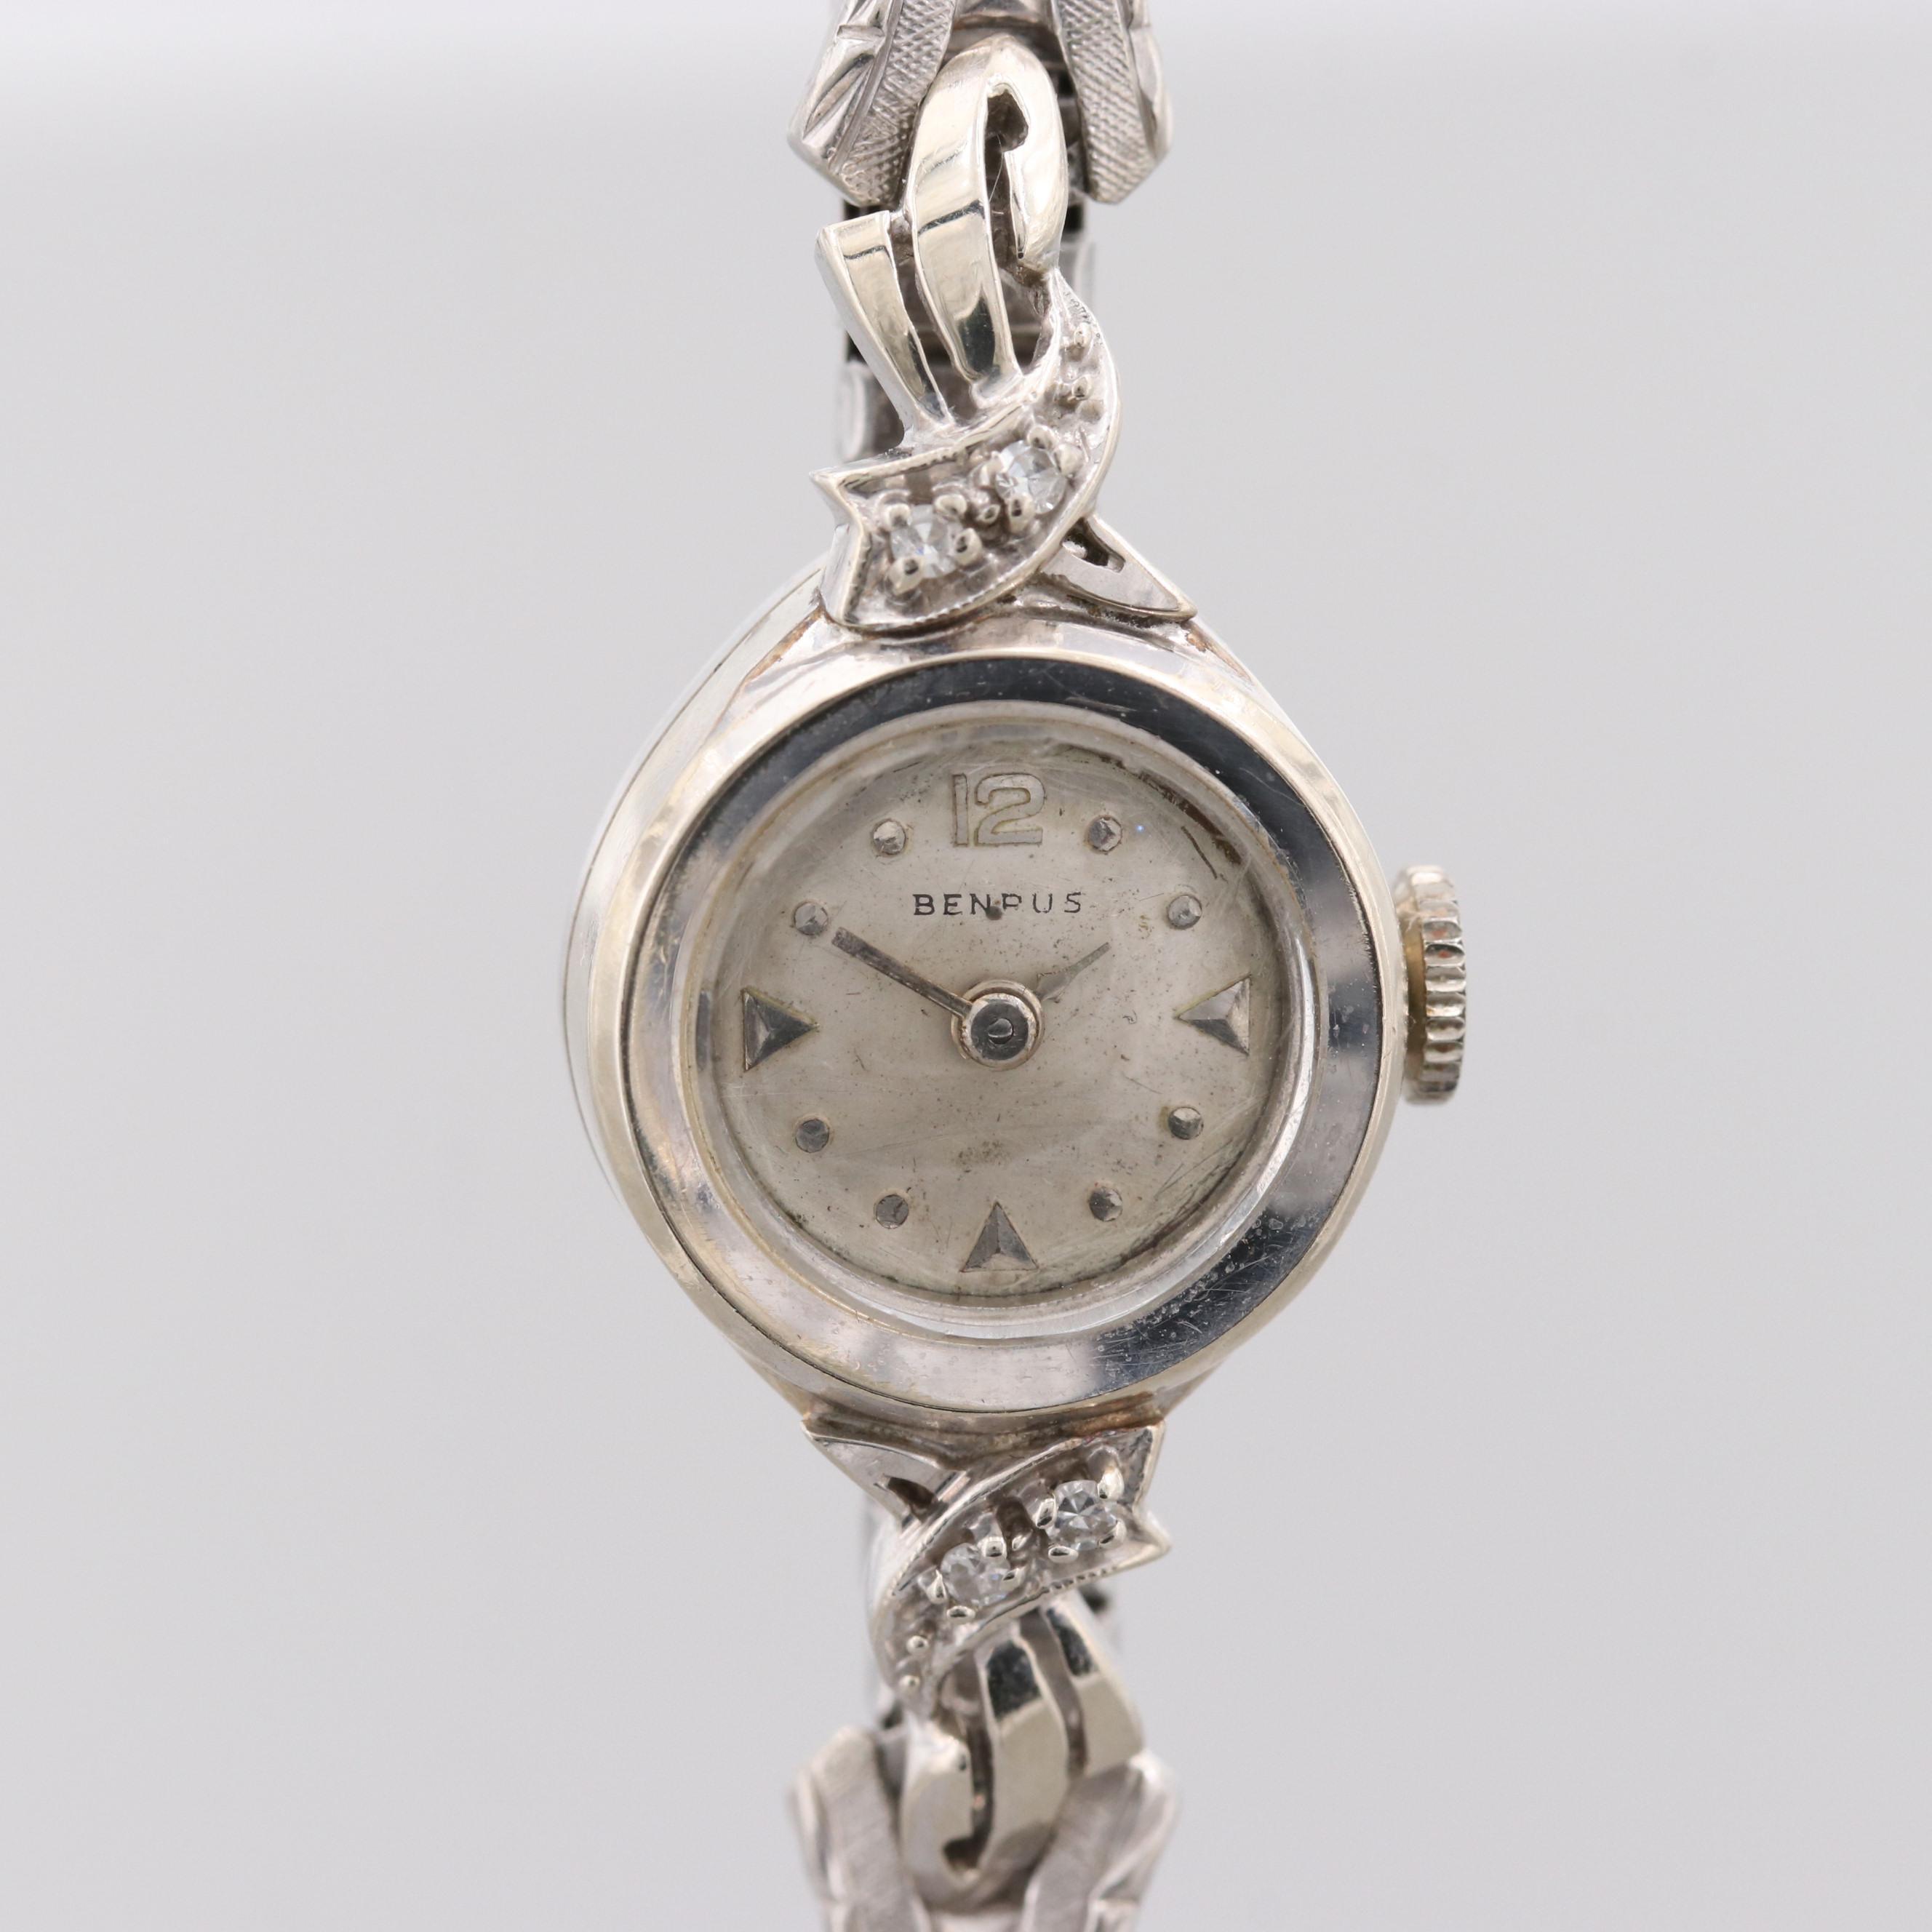 Vintage Benrus 14K White Gold Wristwatch With Diamond Lugs